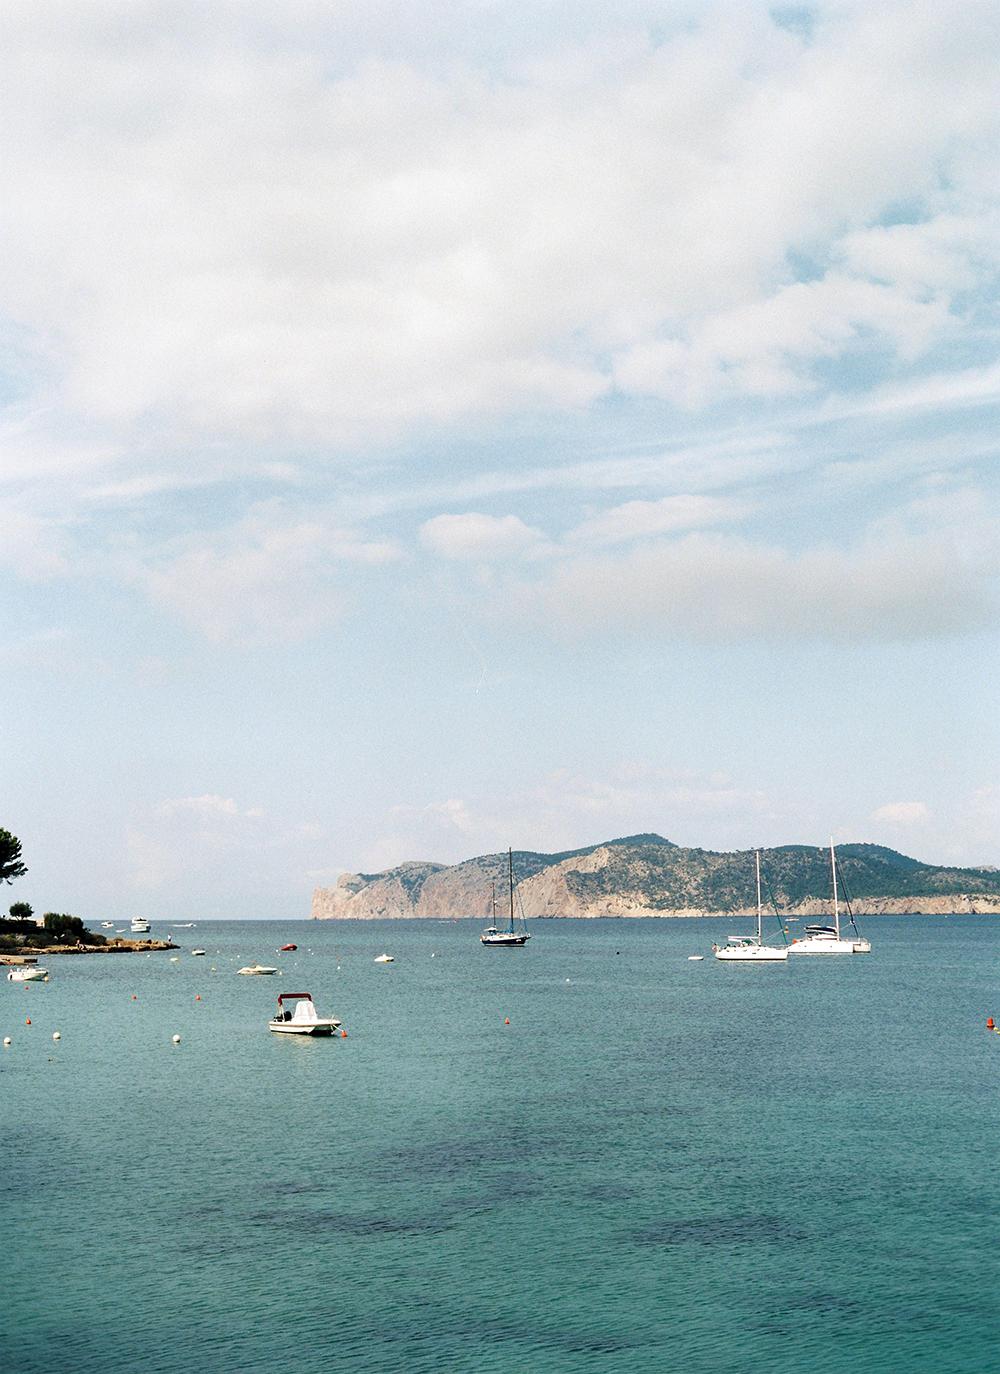 Santa Ponca Mallorca